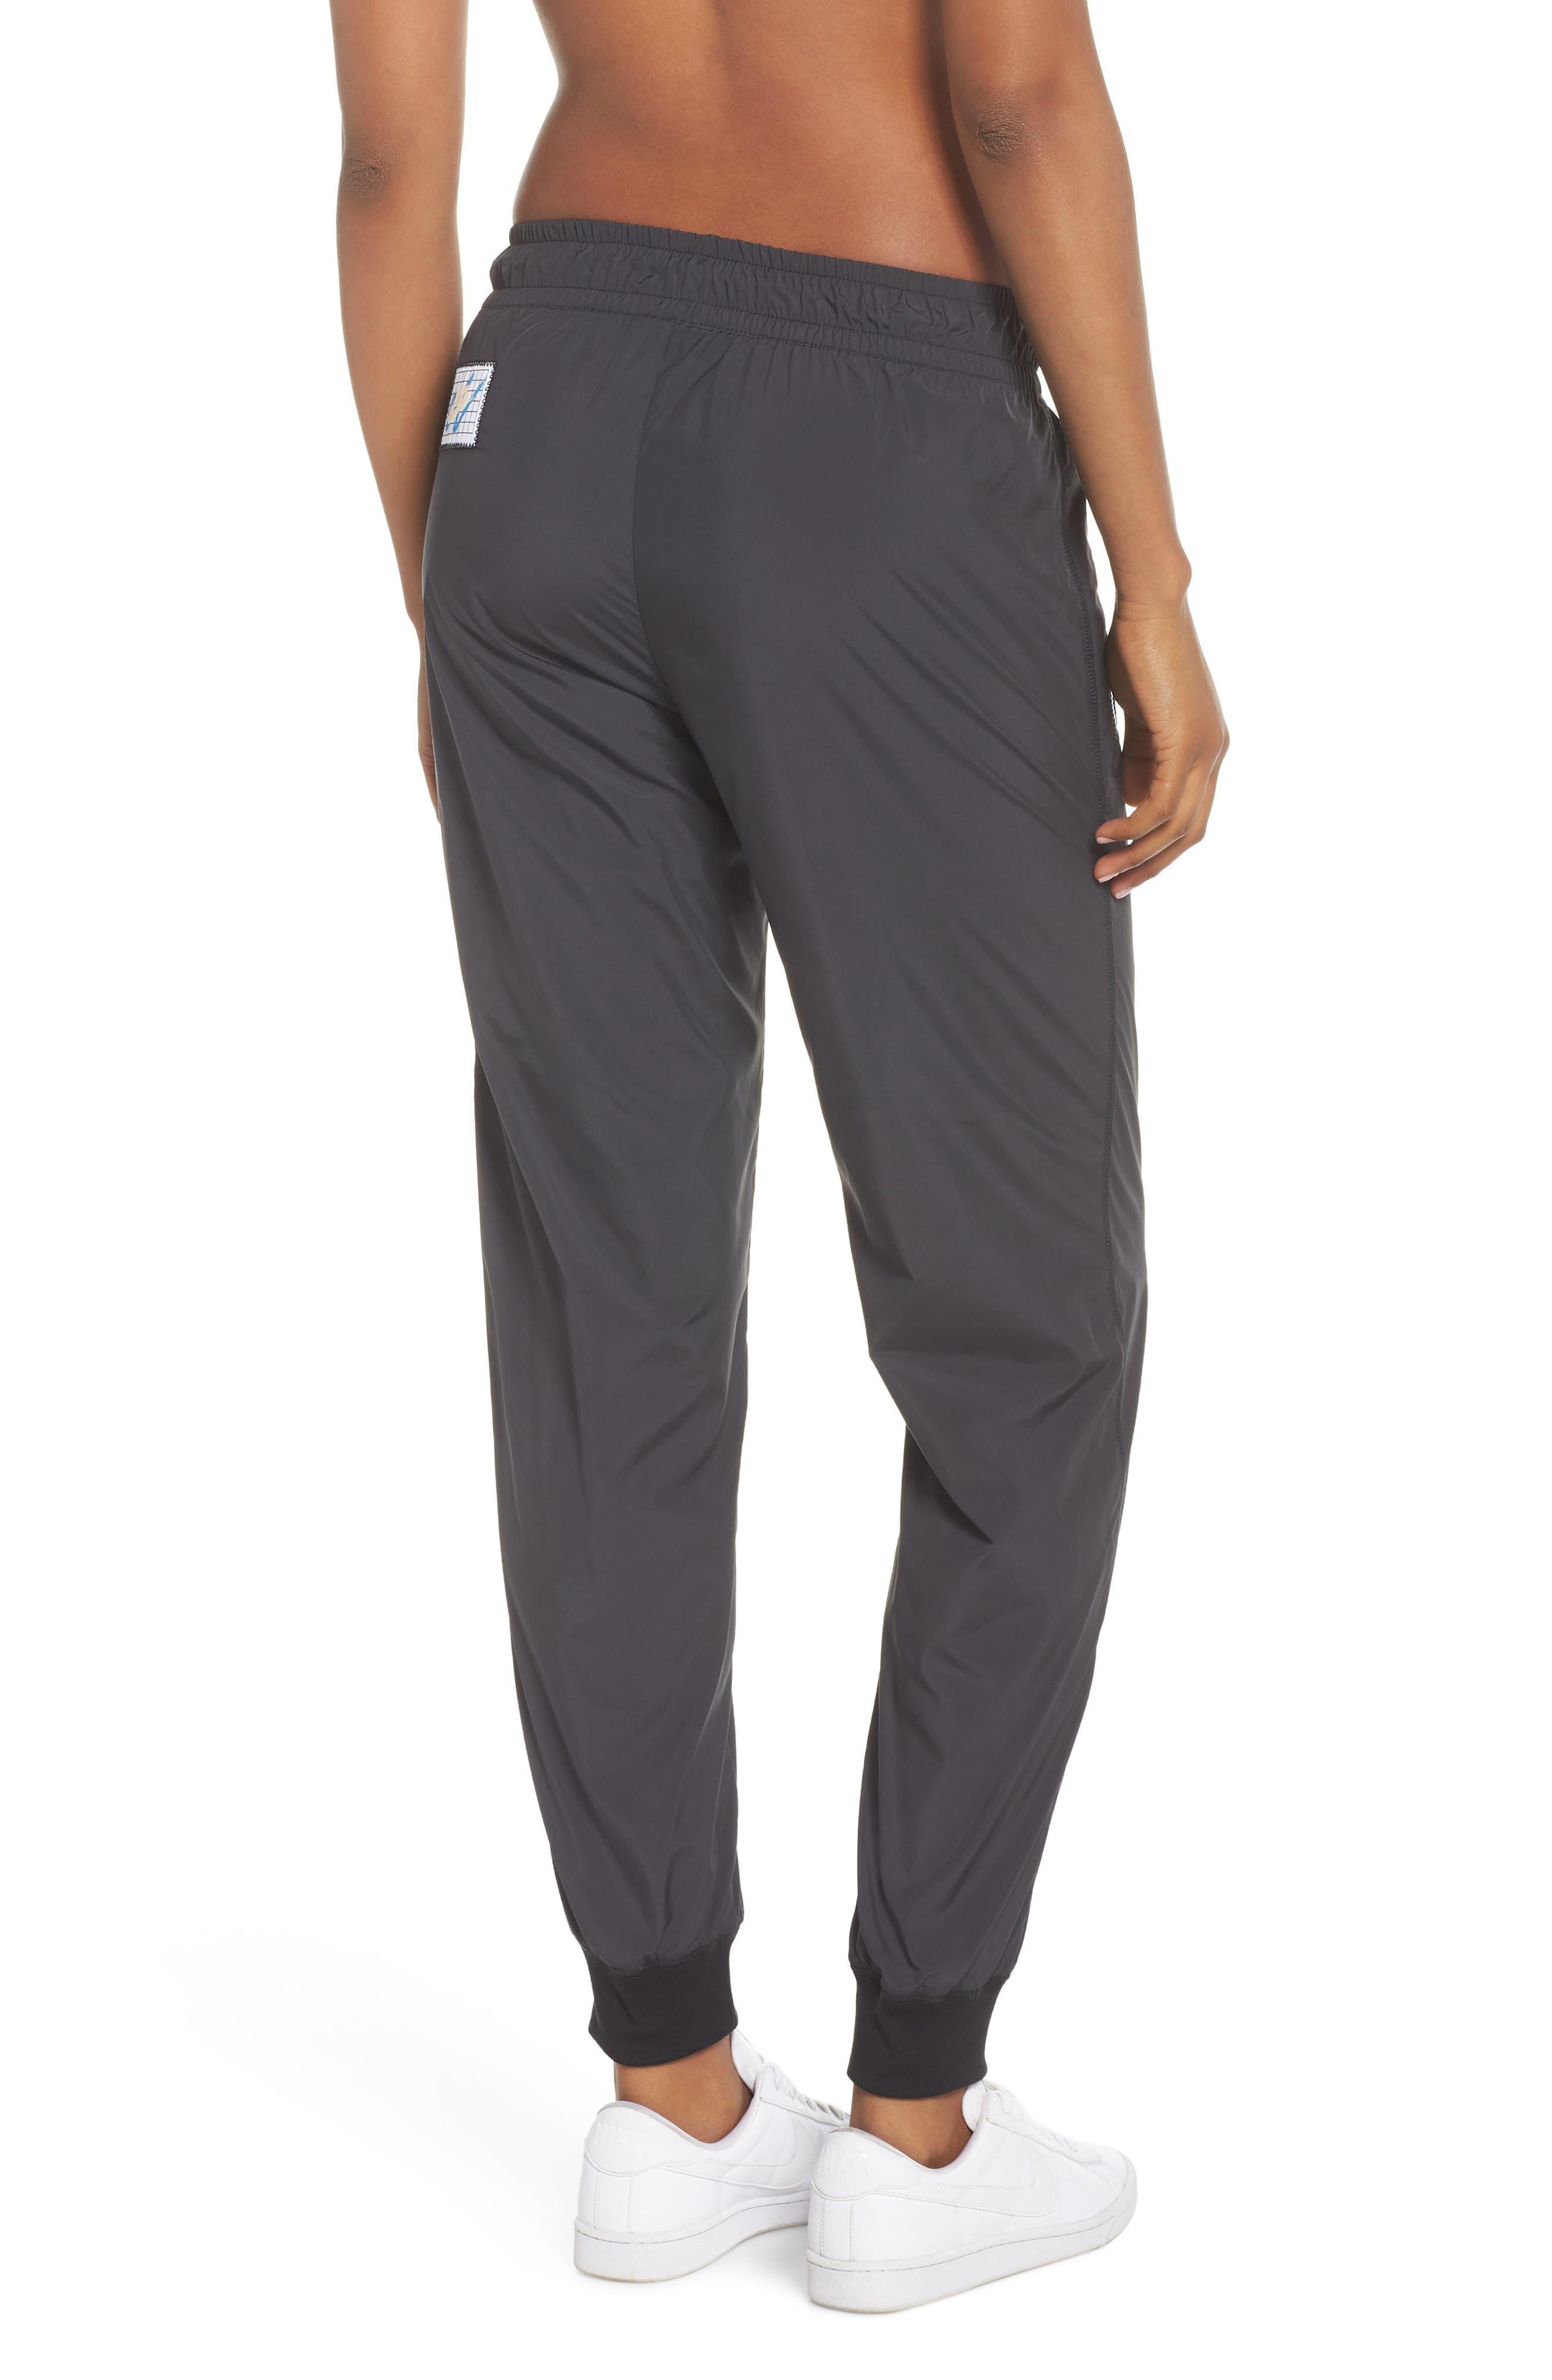 Sportswear Archive Women's Woven Pants,                             Alternate thumbnail 2, color,                             010